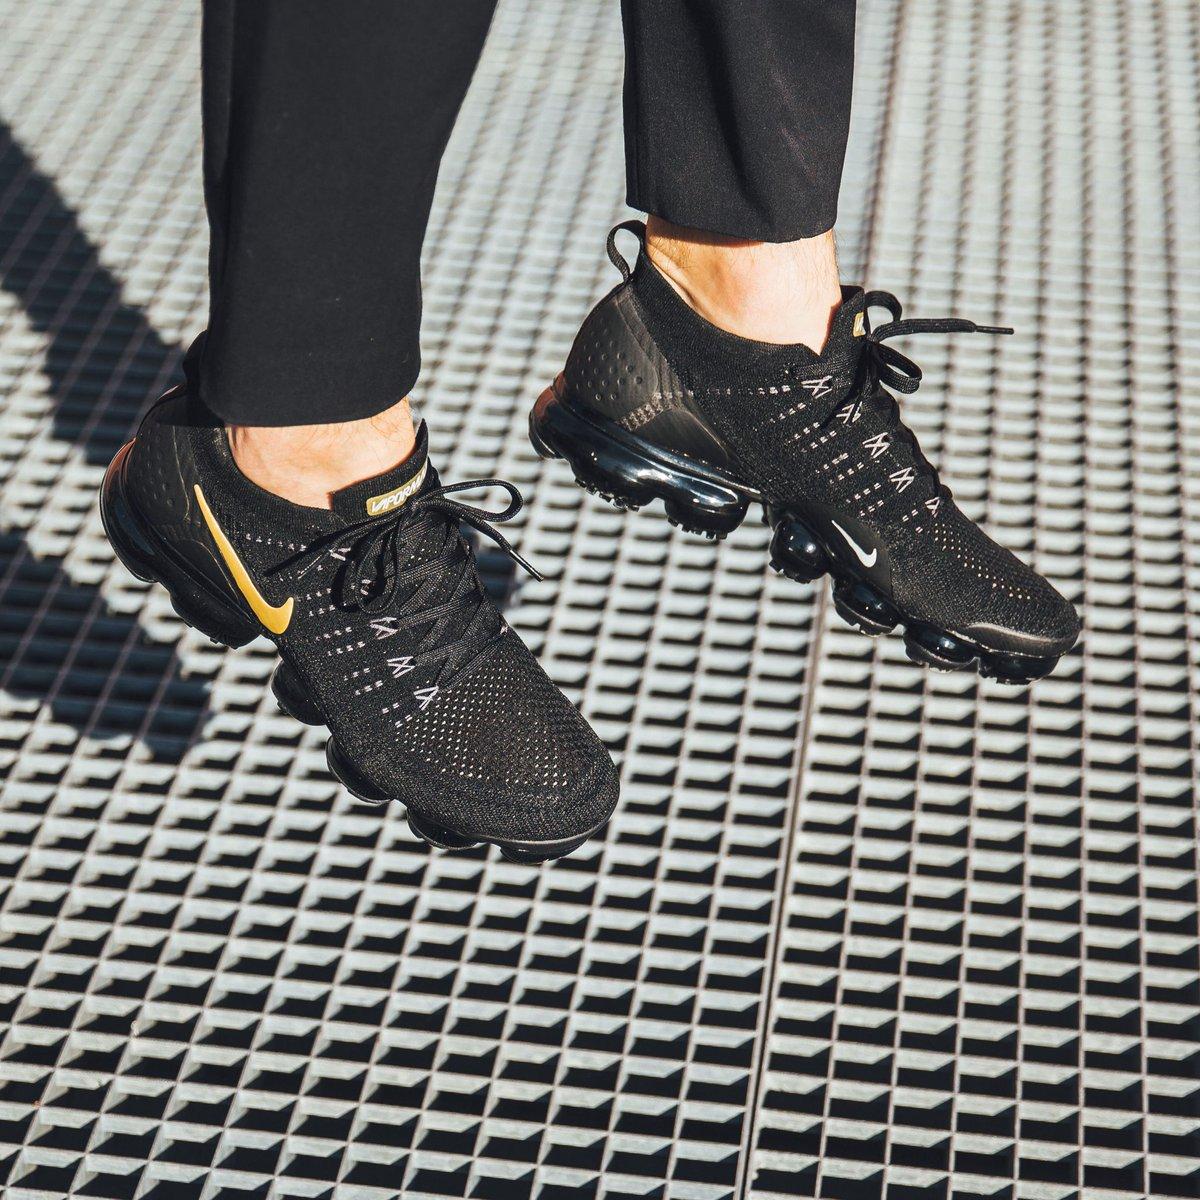 db3d3ec0f23 Another 1 on  sale 💥 Nike Wmns Air Vapormax Flyknit 2 - Black Metallic